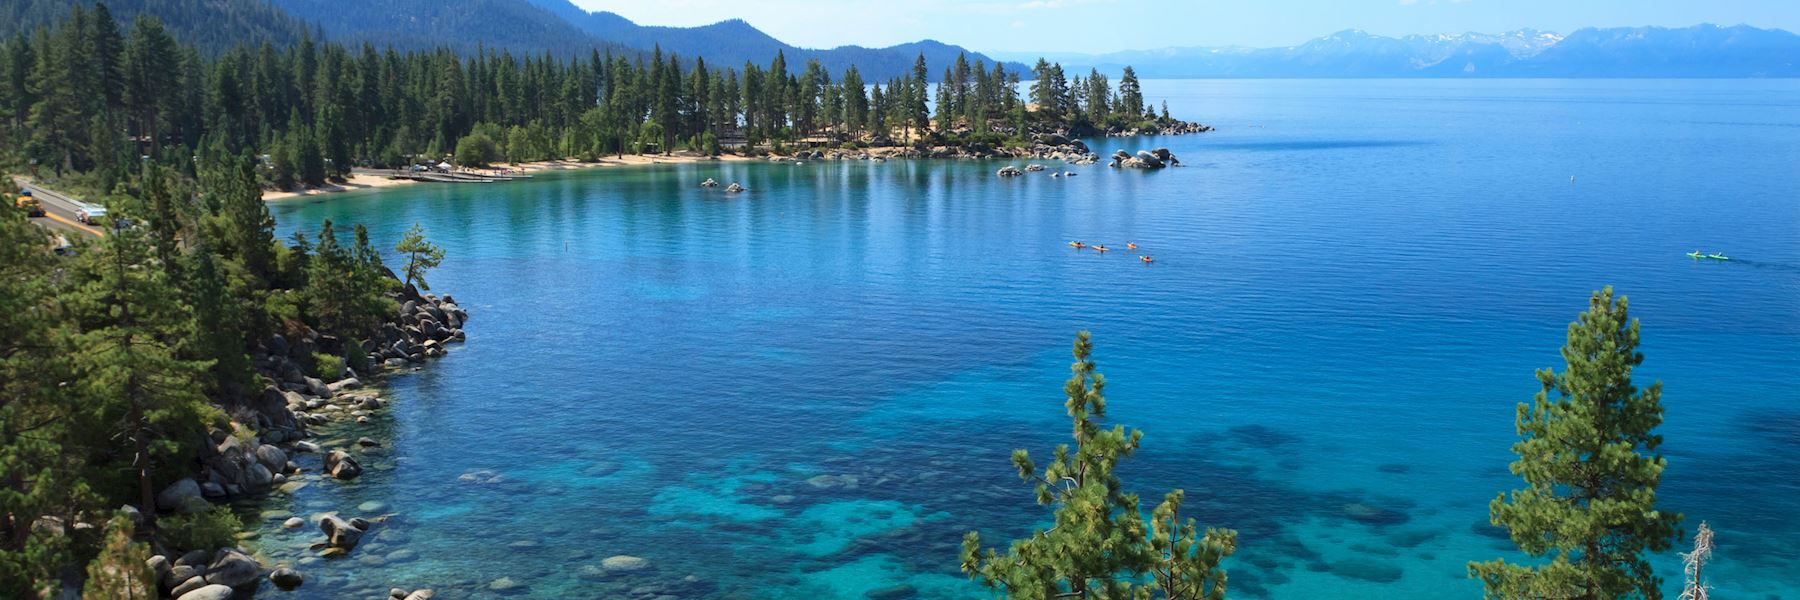 Visit Lake Tahoe, California